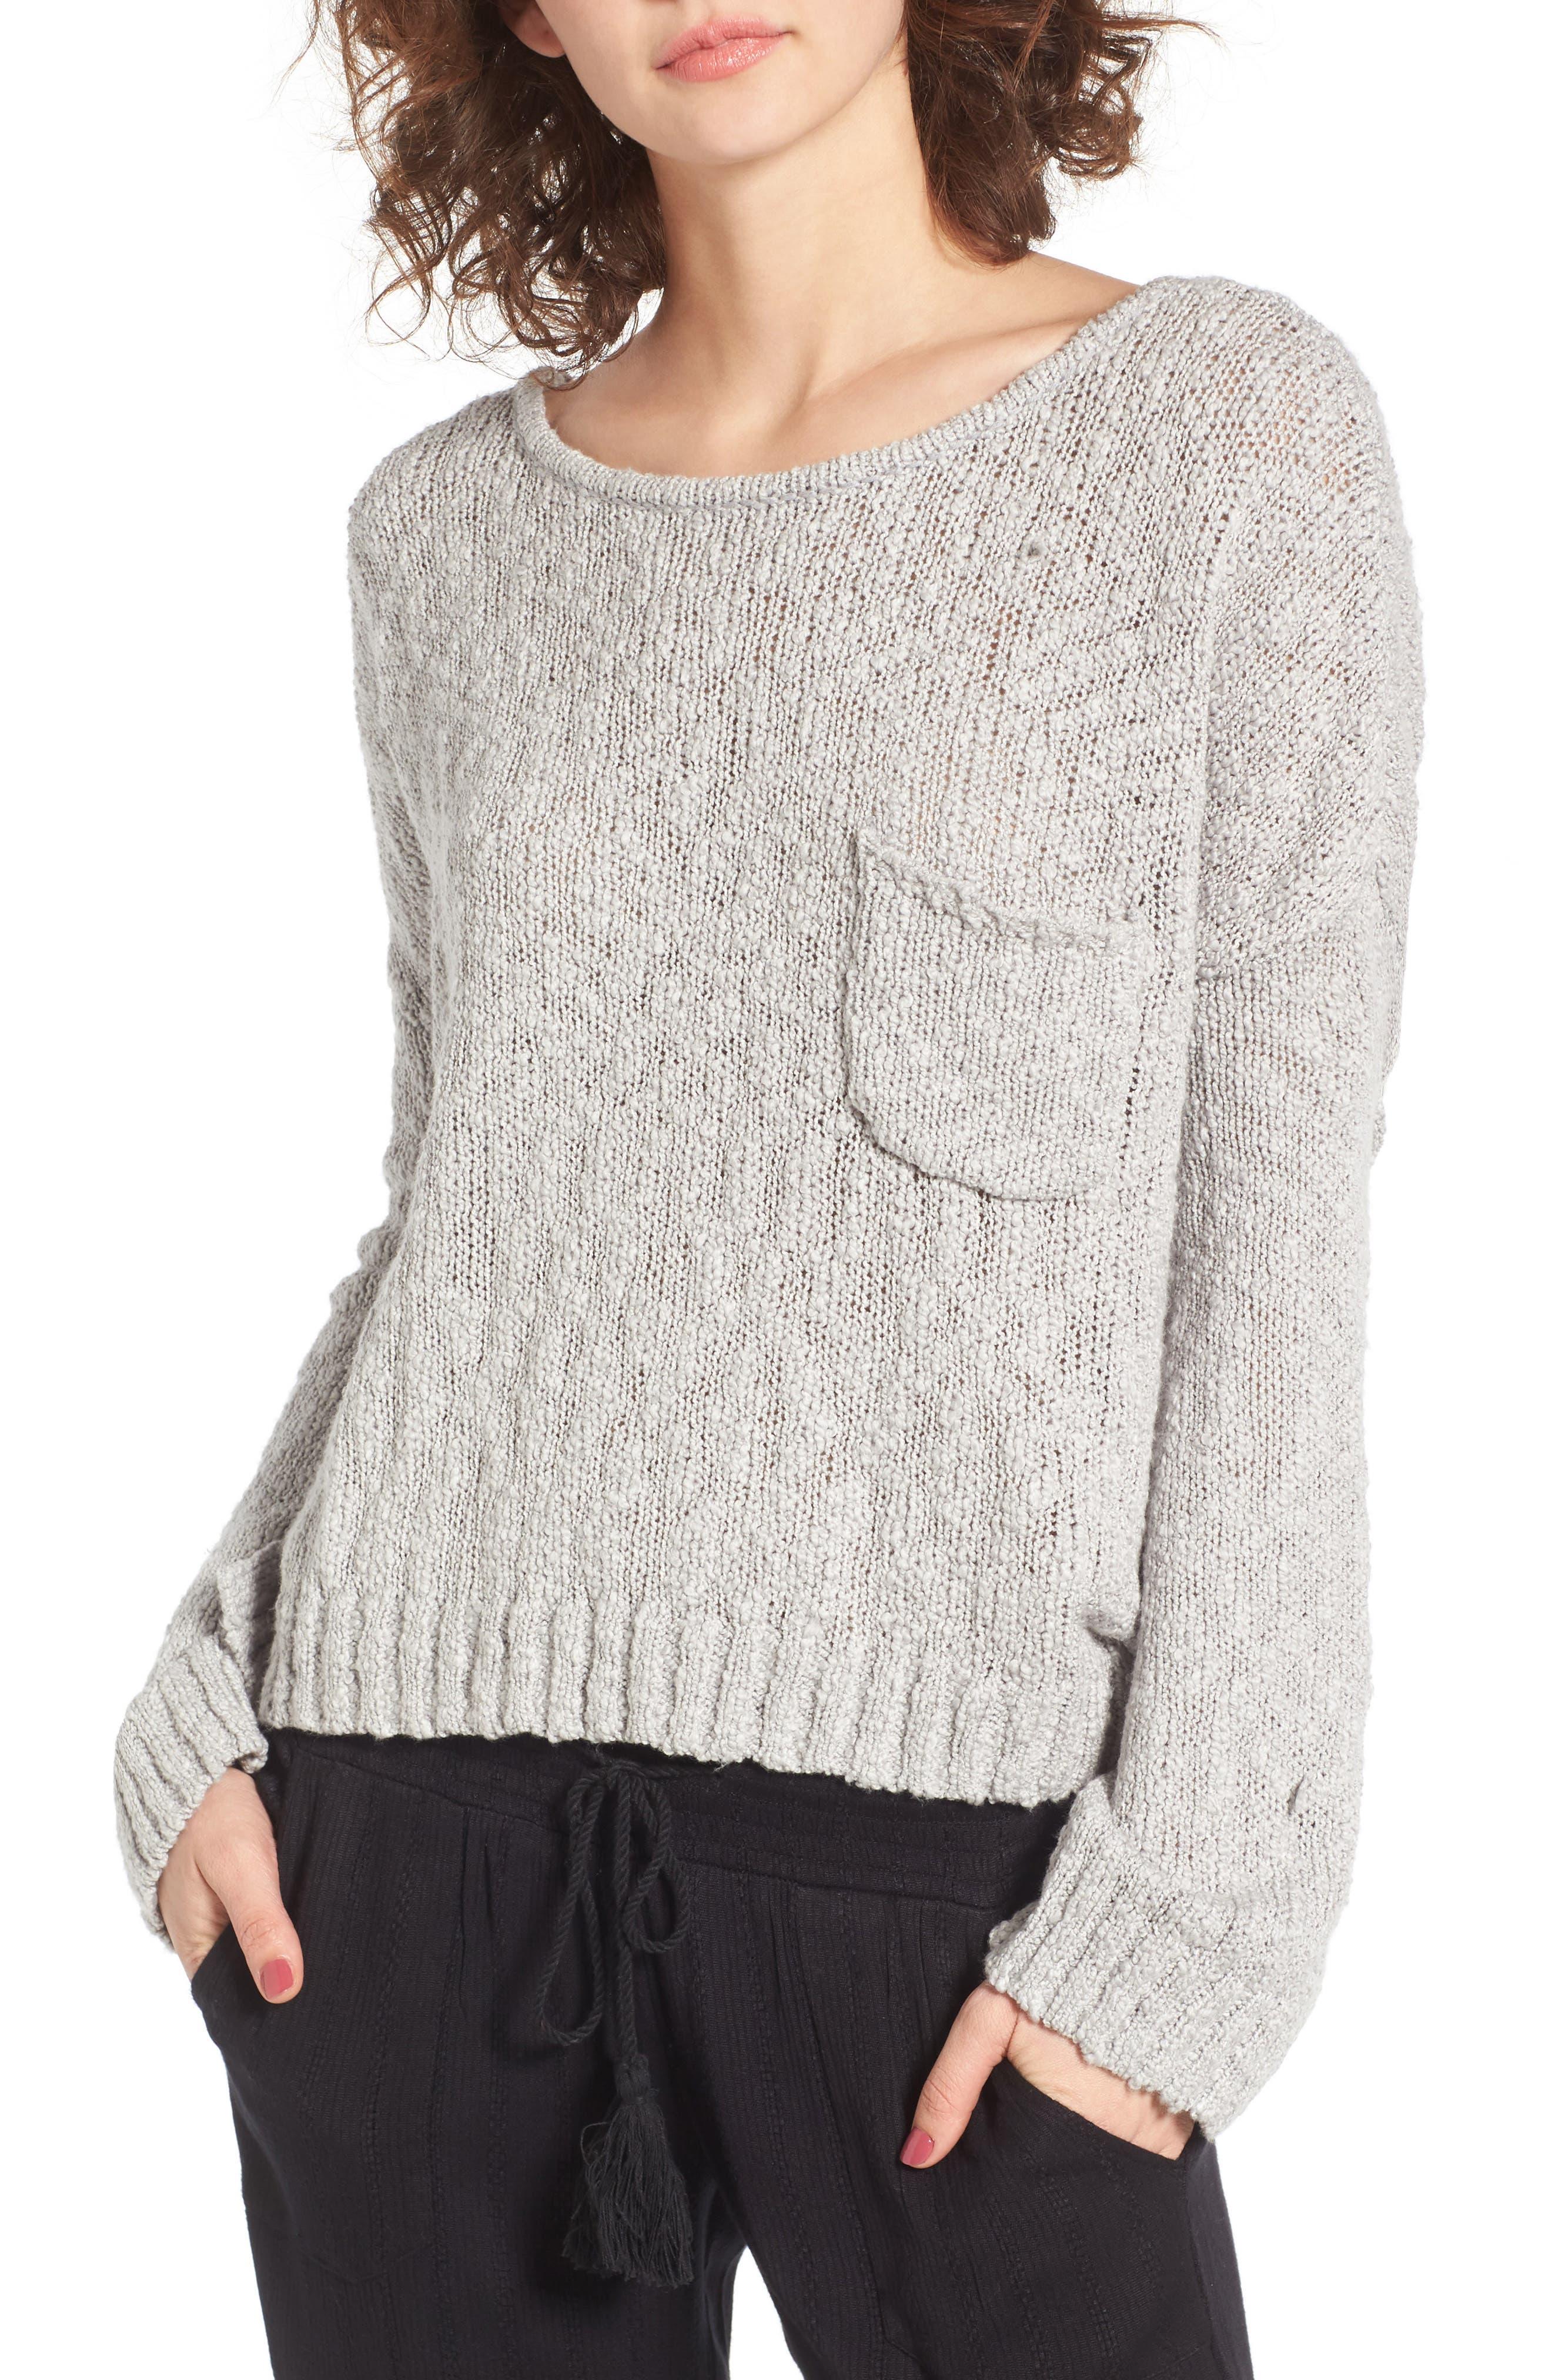 Main Image - Roxy Don't Think Twice Sweater